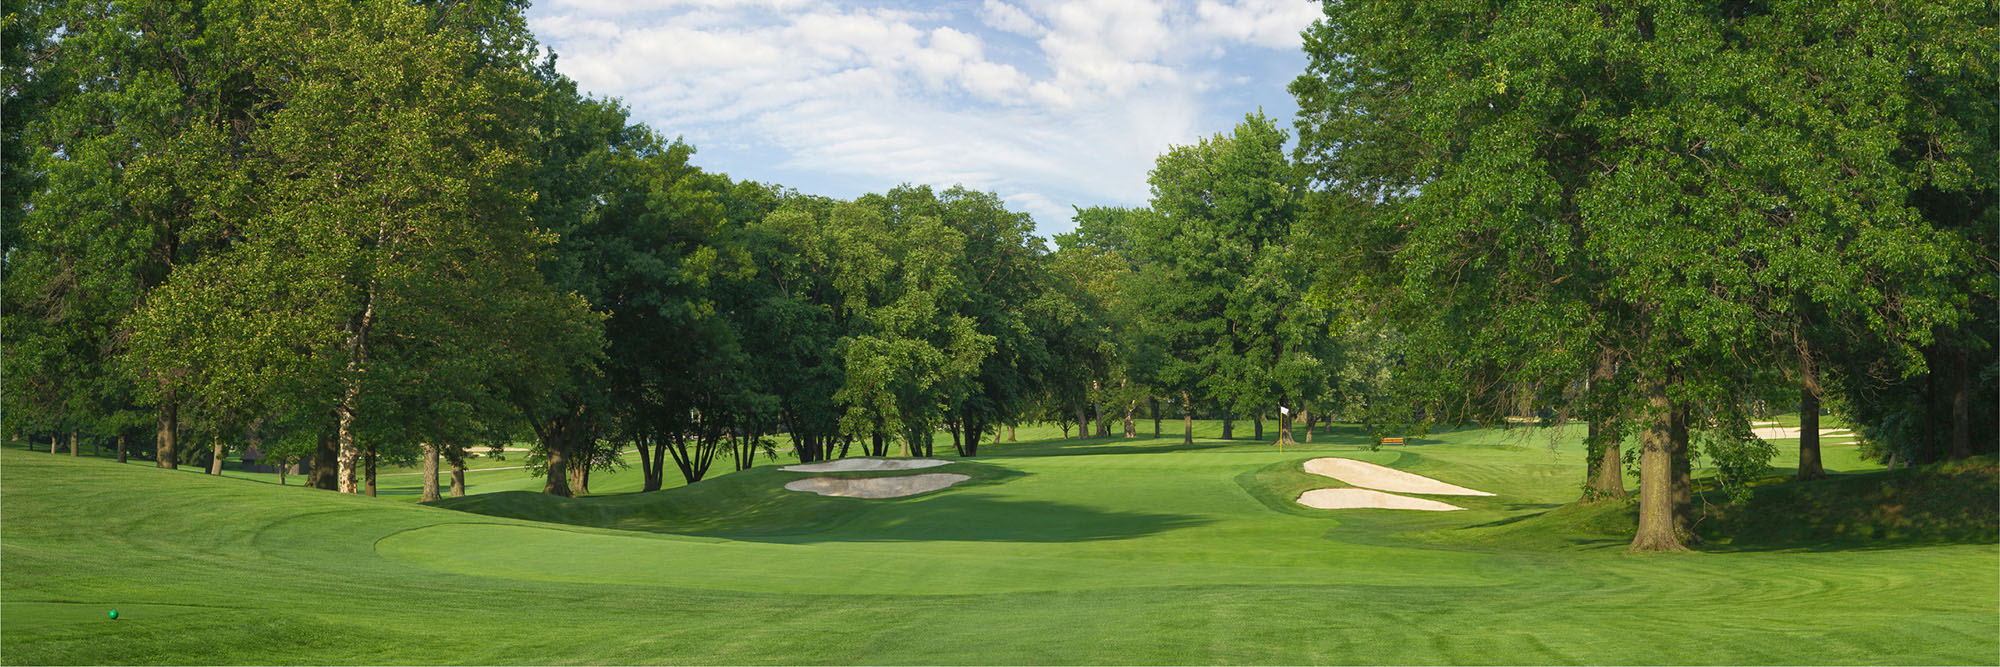 Golf Course Image - Canterbury No. 17